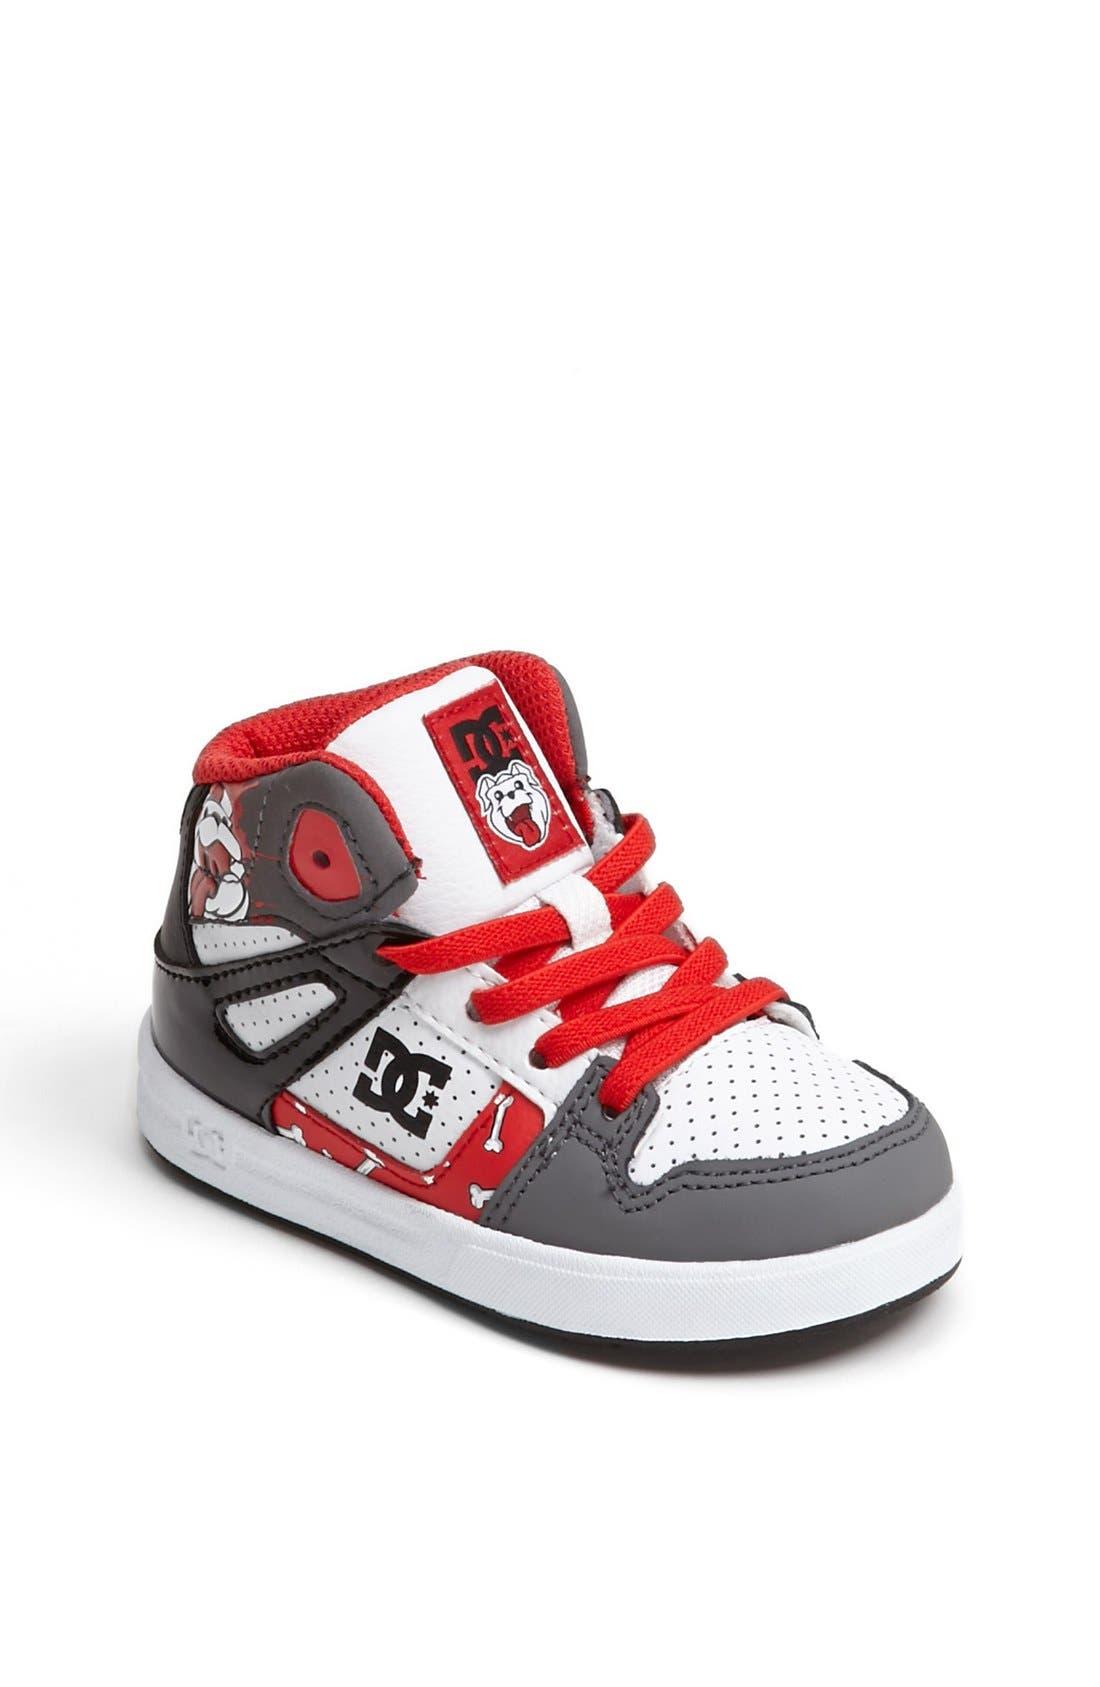 Main Image - DC Shoes 'Wild Grinders - Rebound' Sneaker (Walker & Toddler)